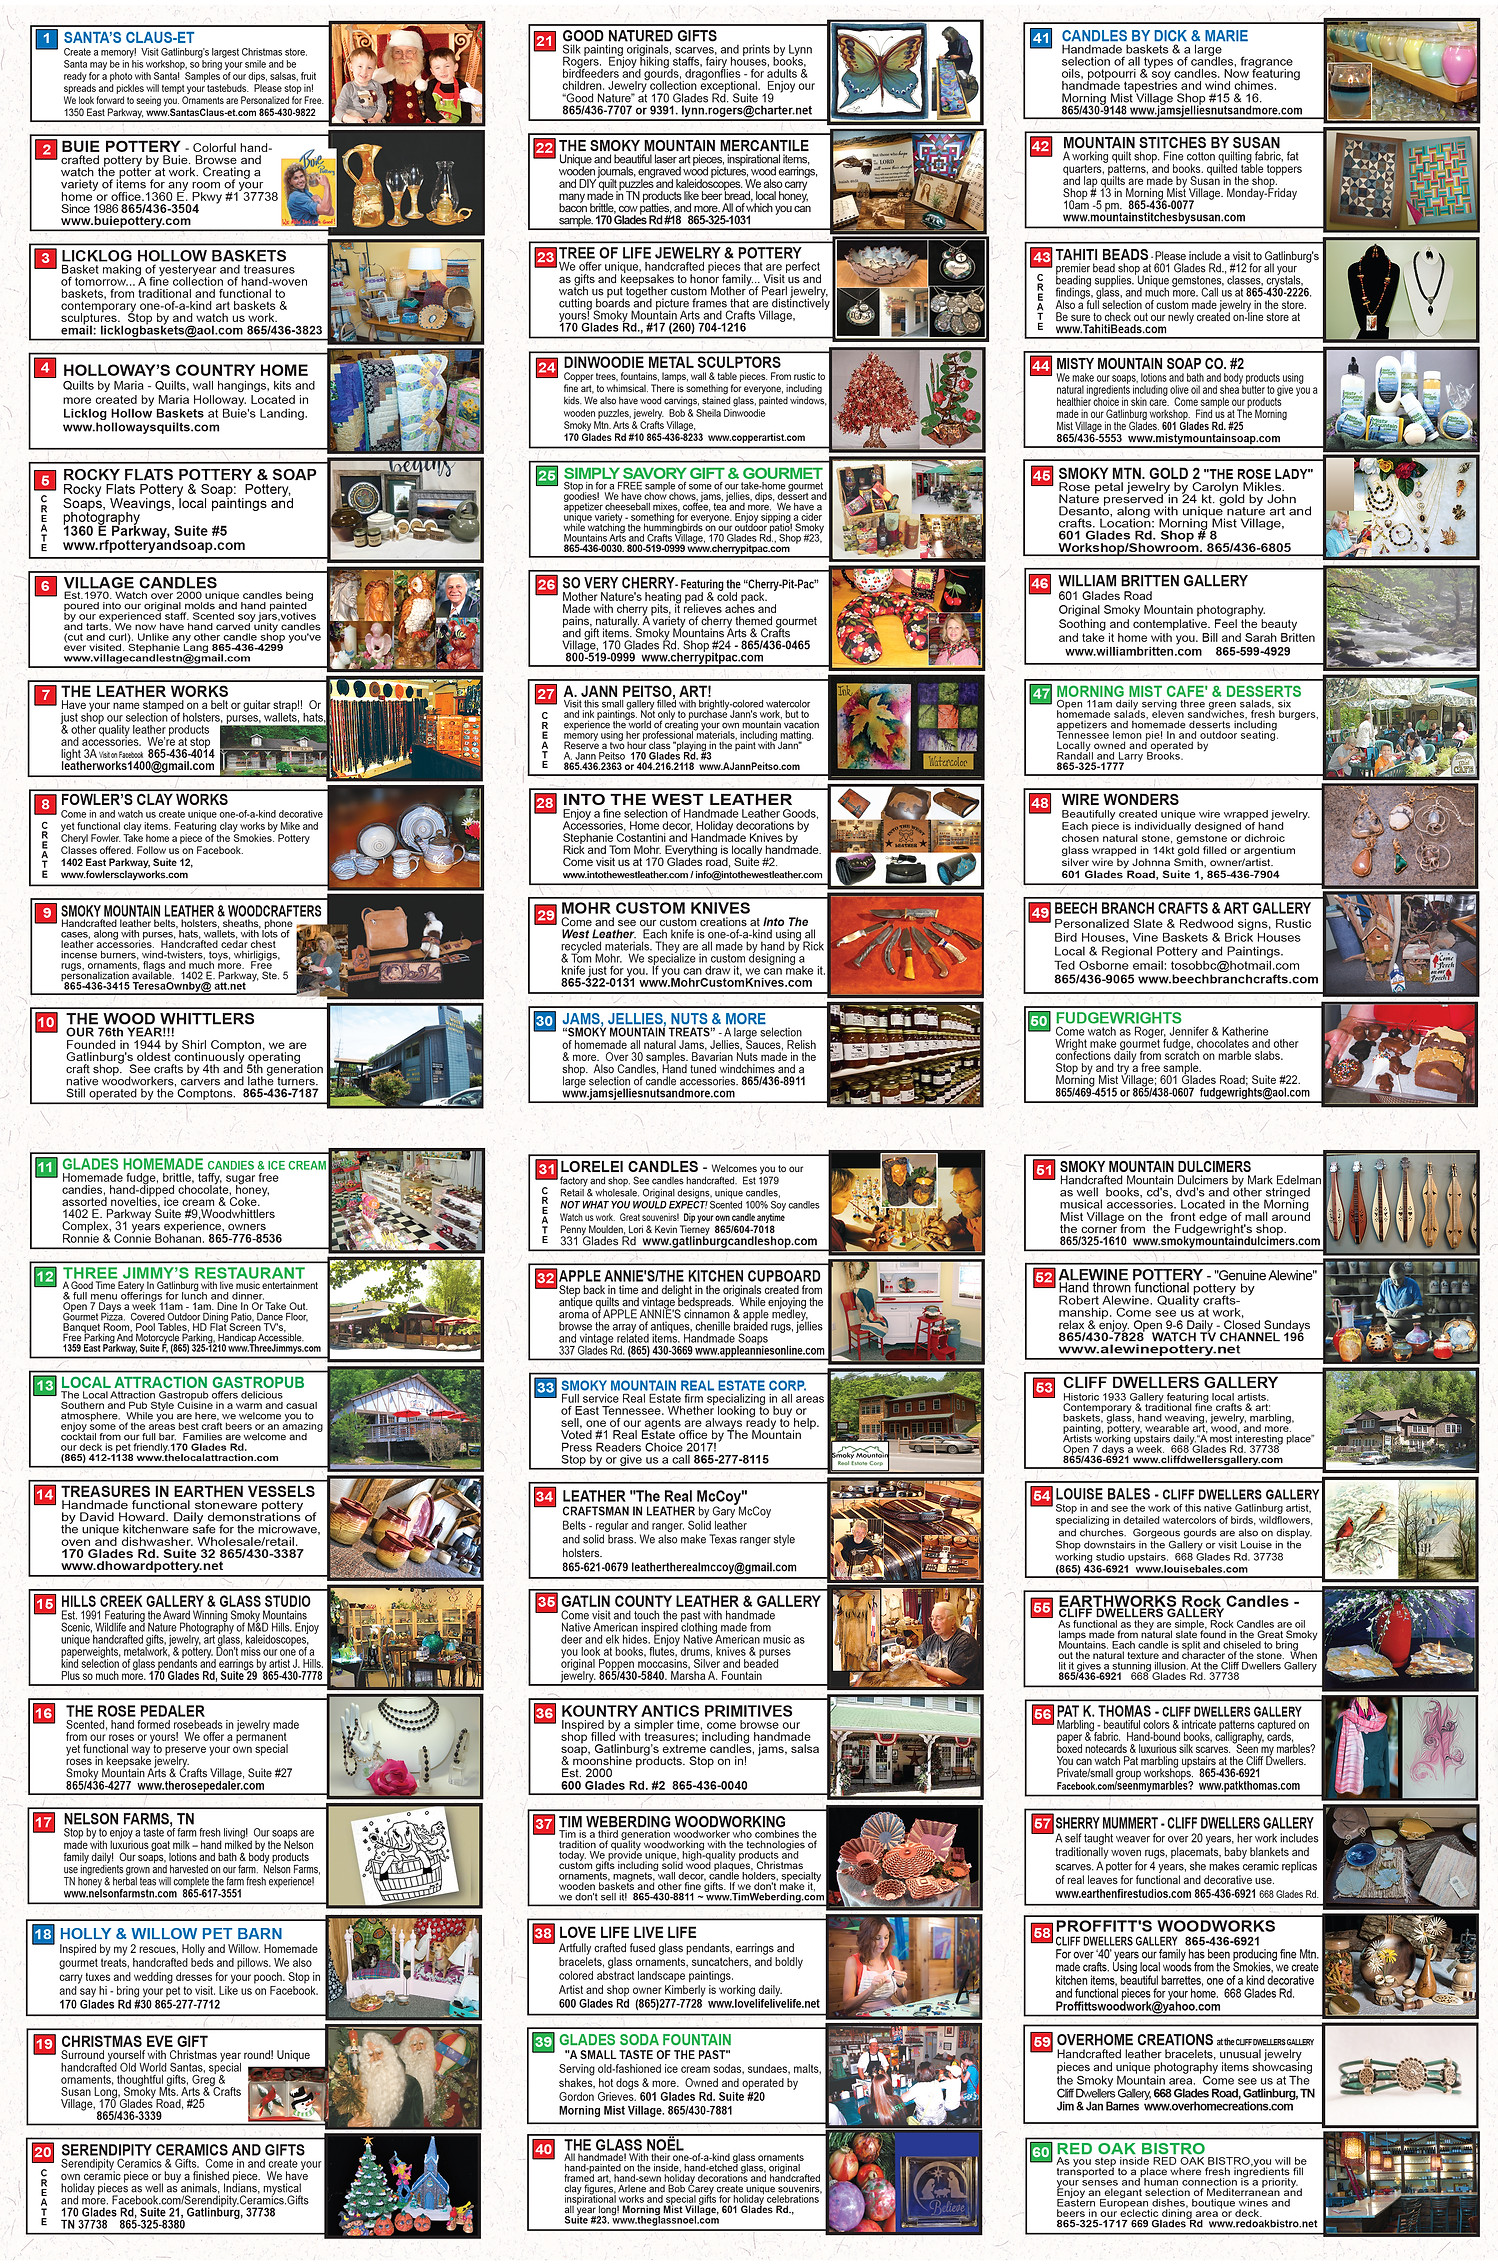 acc brochure FRONT 2020-21 WEB BROCH3.jp